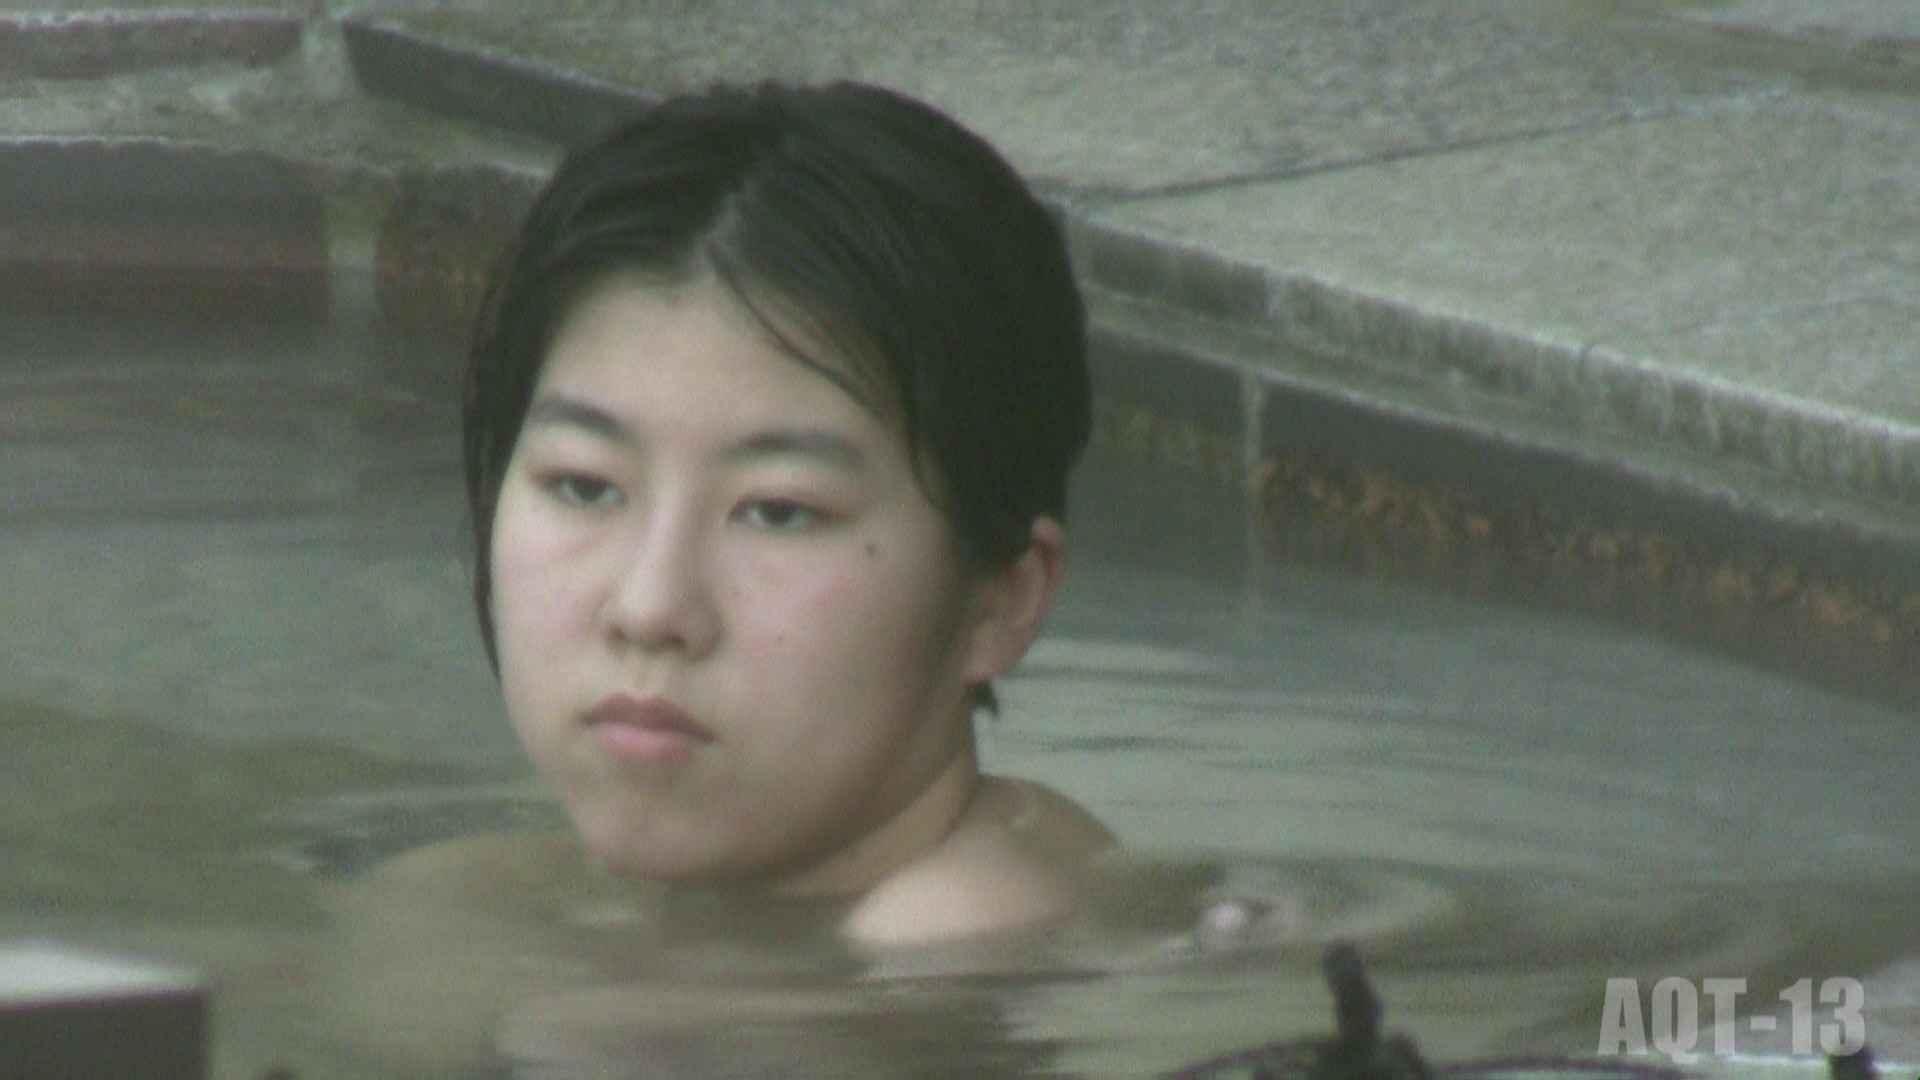 Aquaな露天風呂Vol.816 盗撮   OLエロ画像  105PICs 16